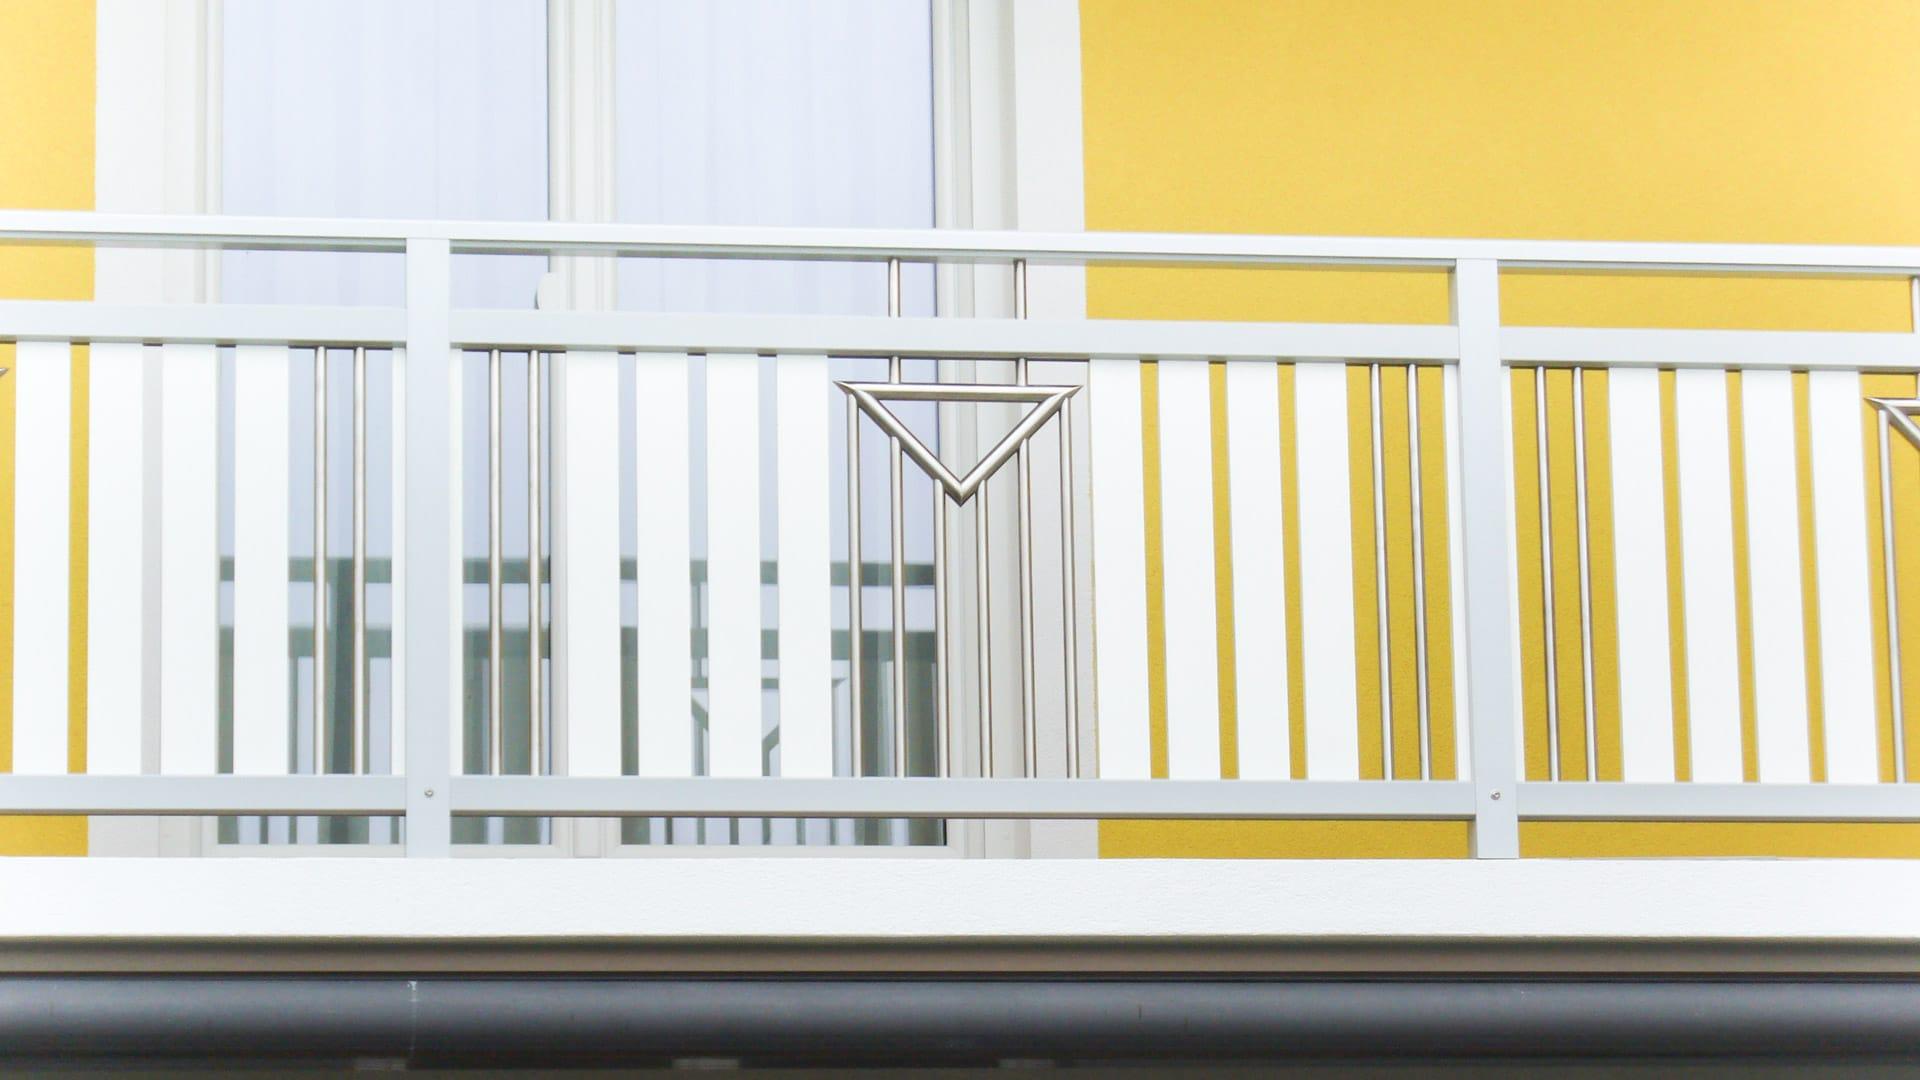 Krems 02 a | Aluminium-Balkongeländer mit Alulatten senkrecht und Niro Dreieck Stab Dekor | Svoboda